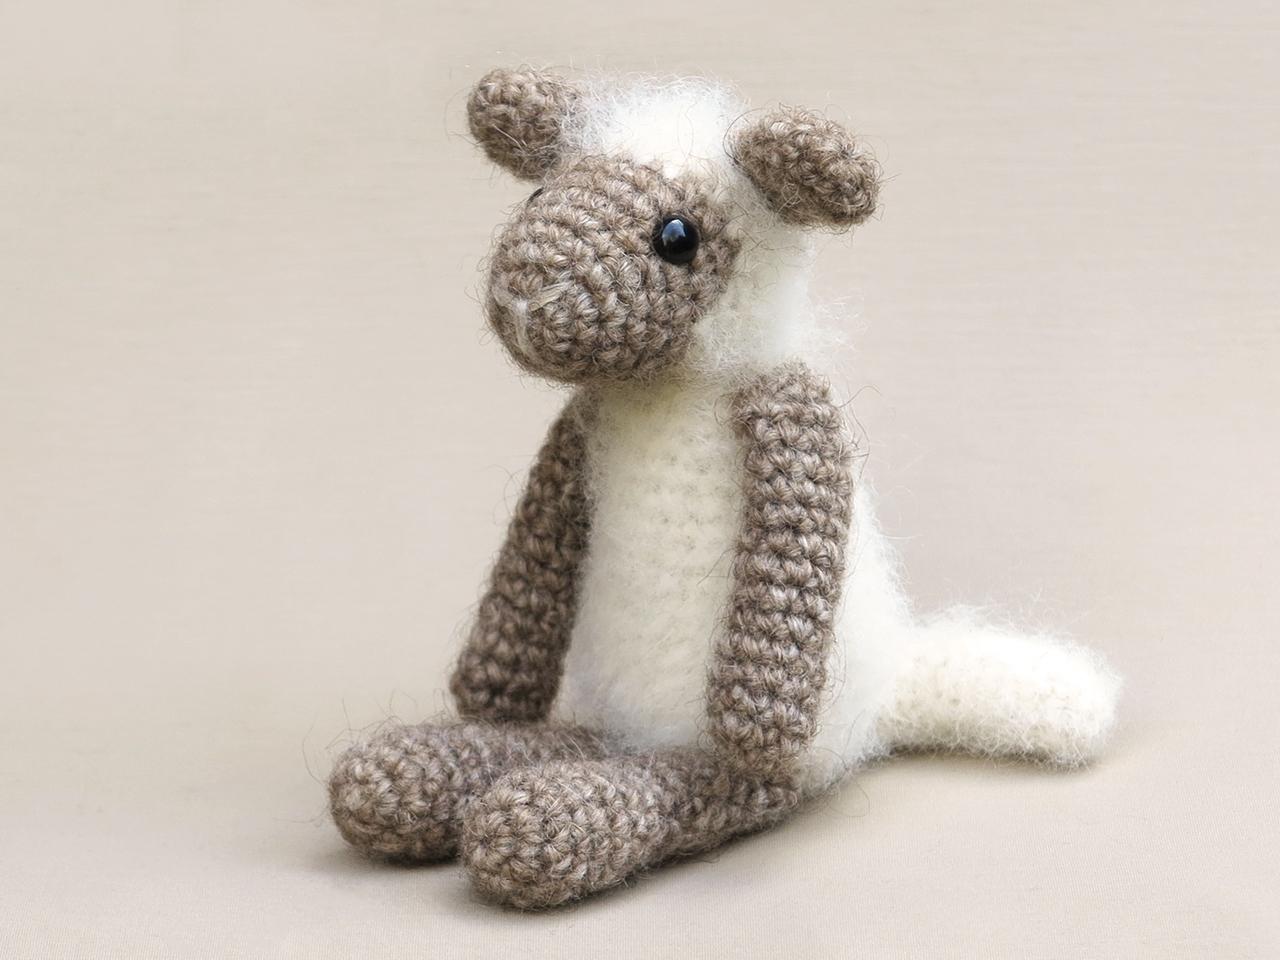 Amigurumi Sheep Pattern | Modelos de crochê, Artesanato croche ... | 960x1280